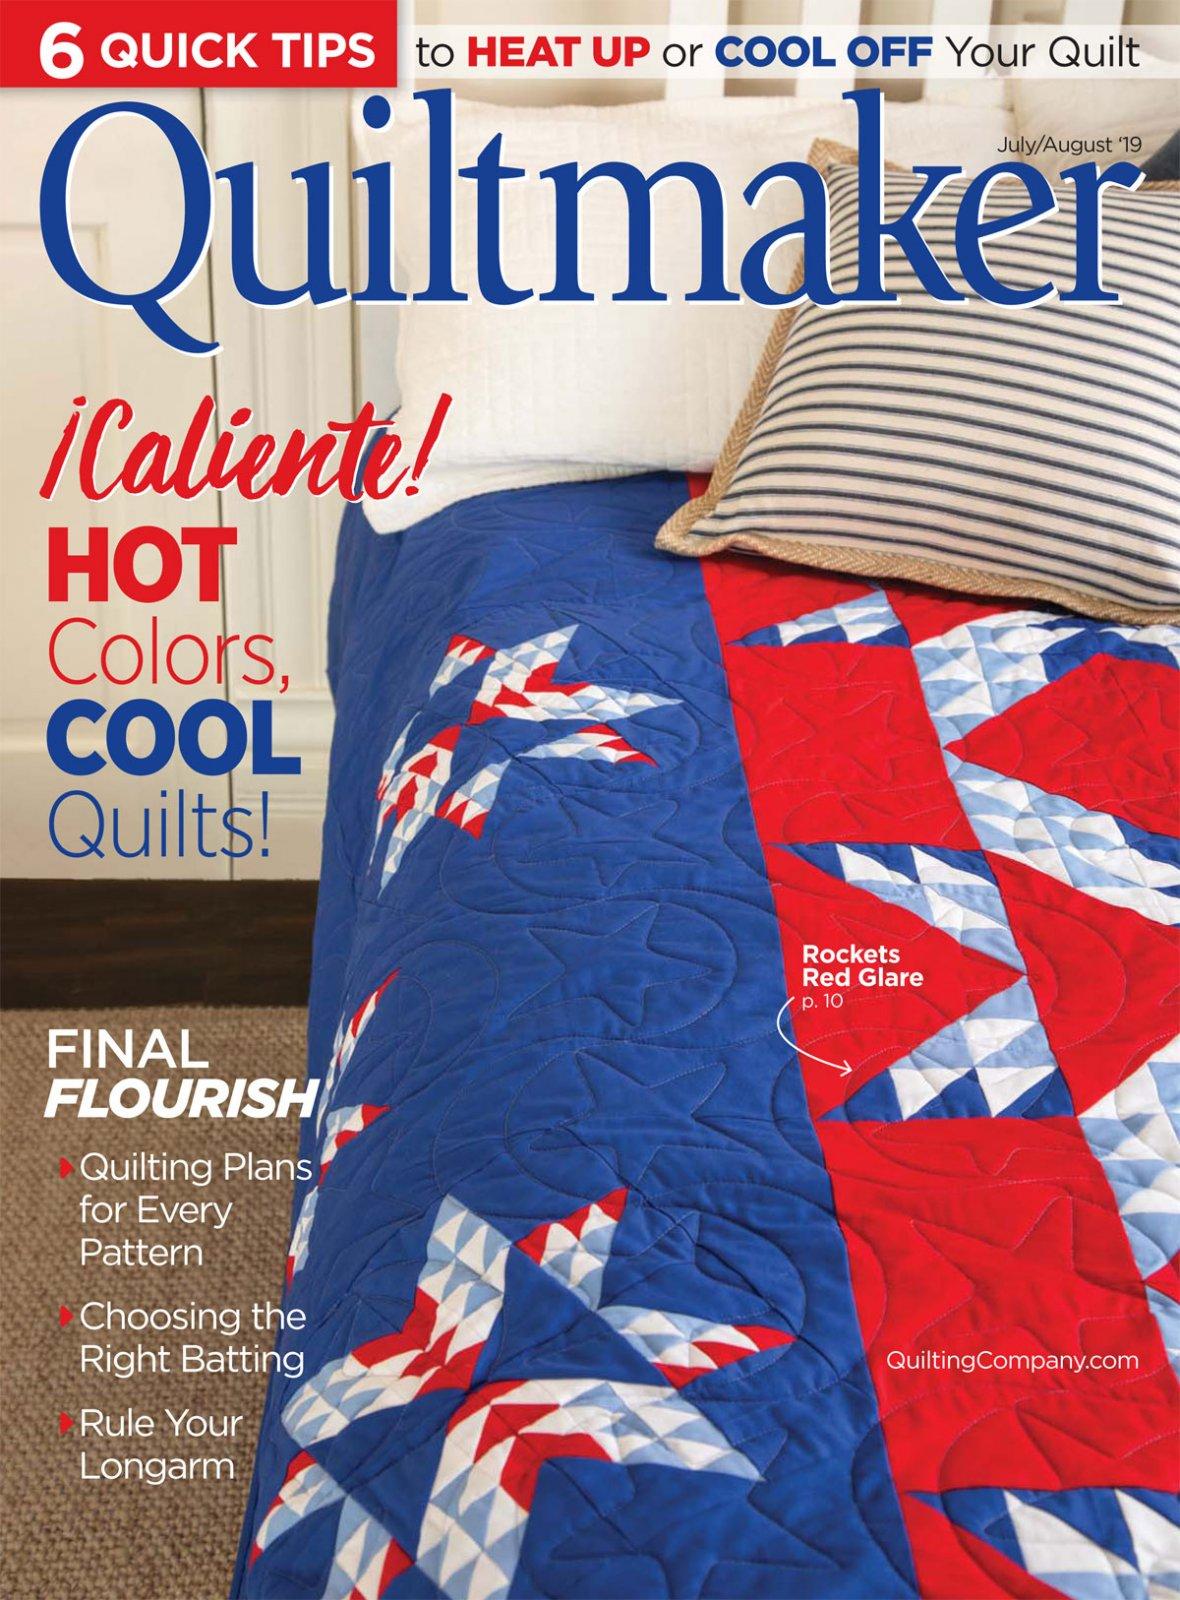 Quiltmaker Magazine July/August 2019